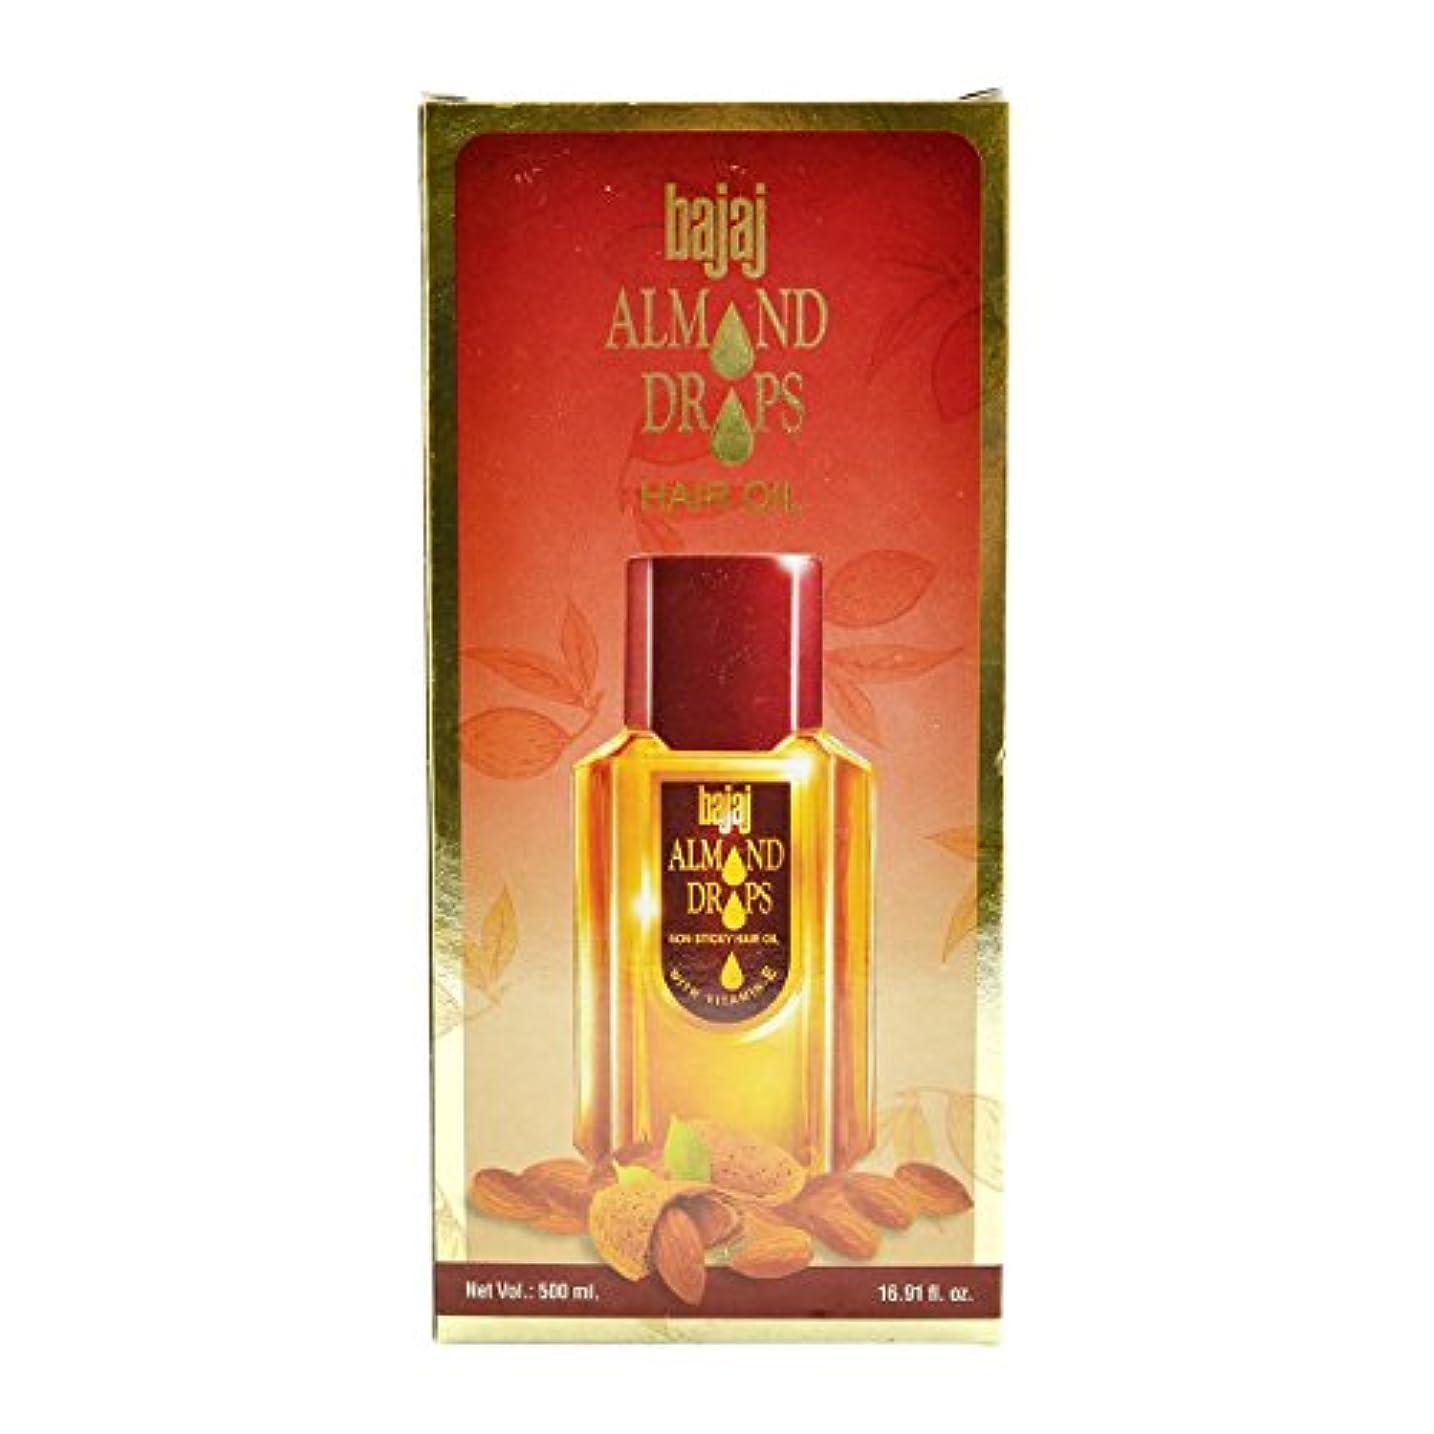 記念品十代金属Bajaj Almond Drops Hair Oil -500ml(16.91 Floz.) by Subhlaxmi Grocers